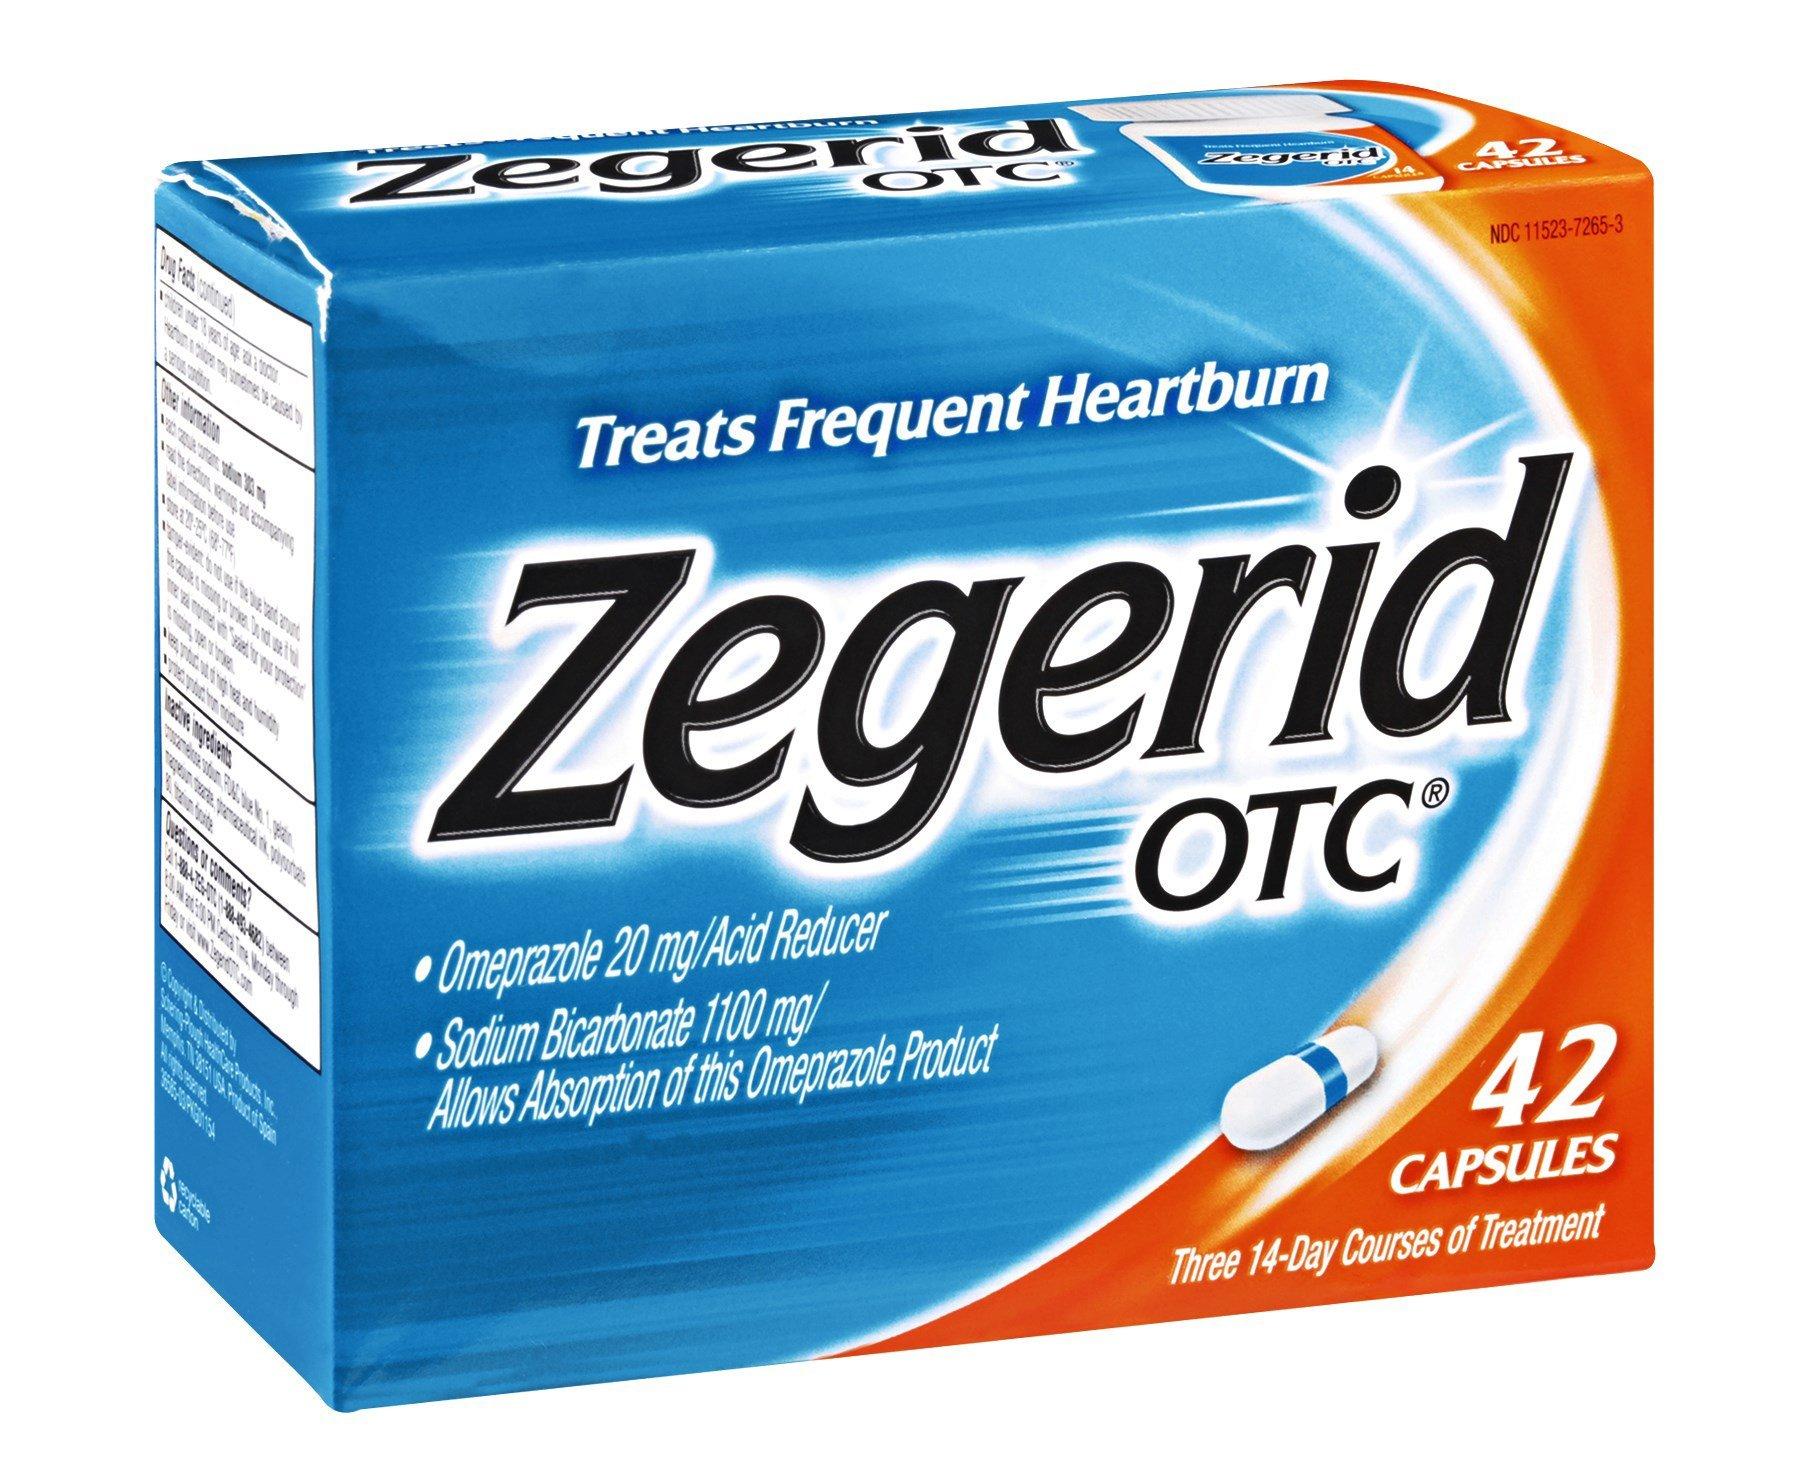 Zegerid OTC Capsules, Pack of 4